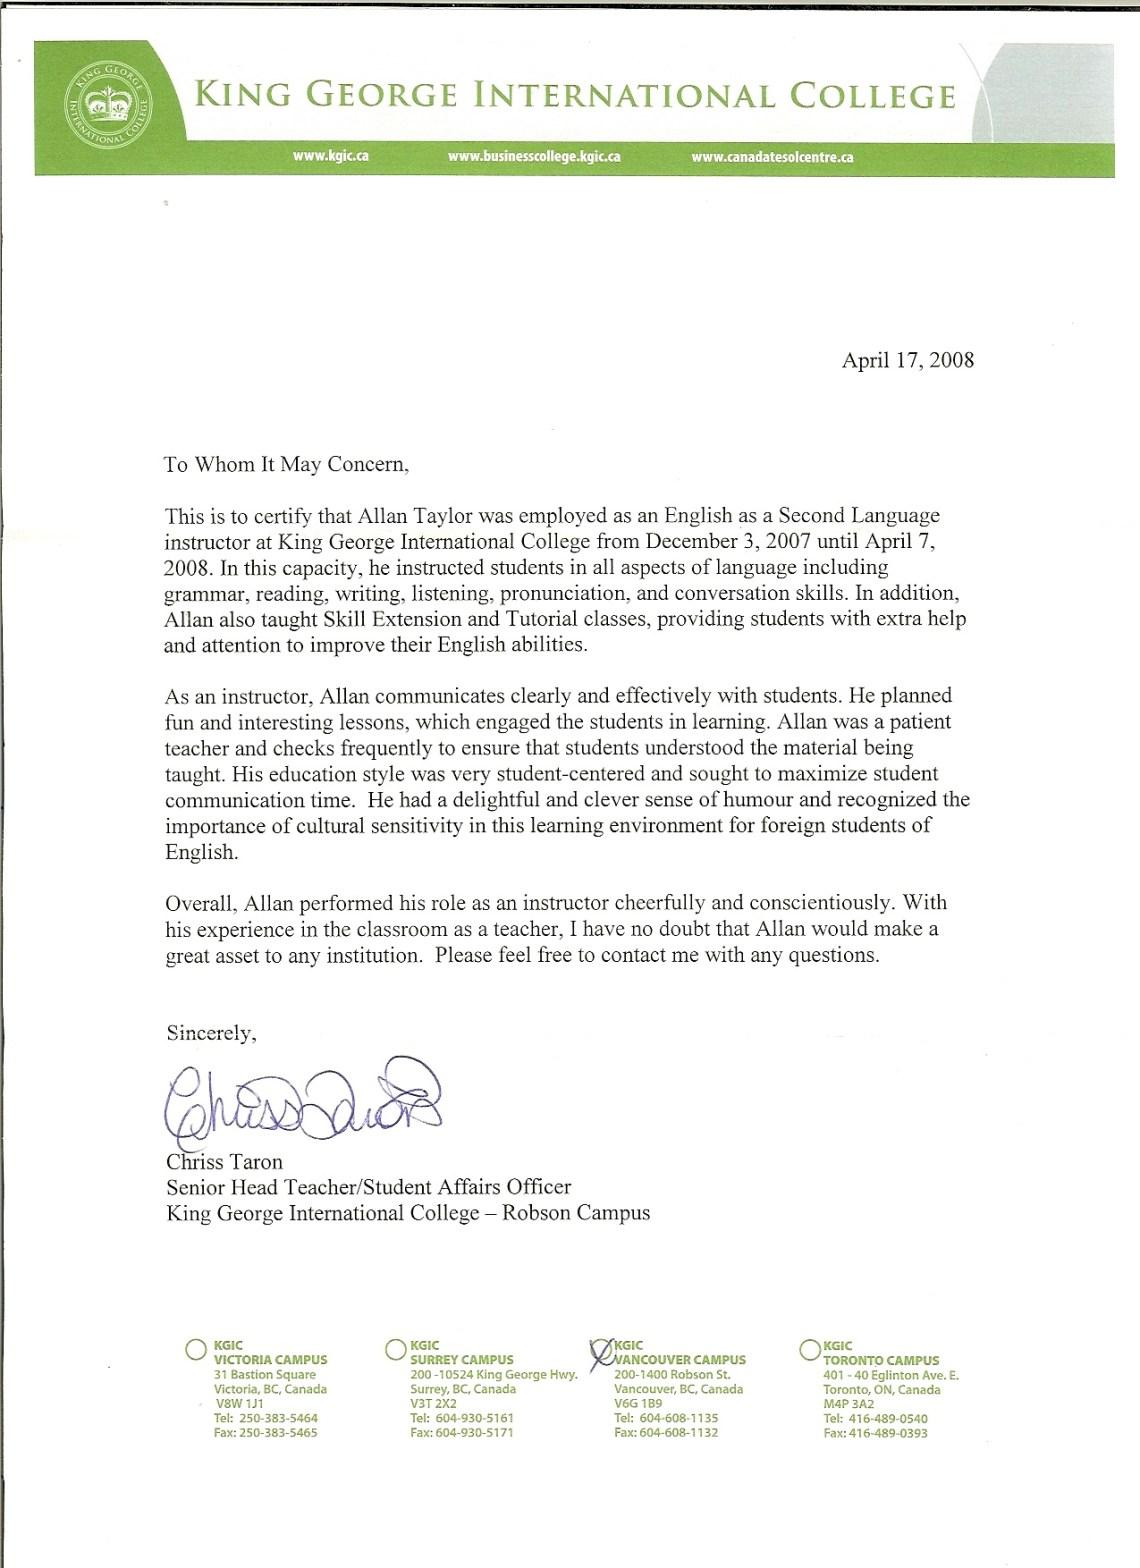 Letters Of Recommendation For Teacher Elitadearest